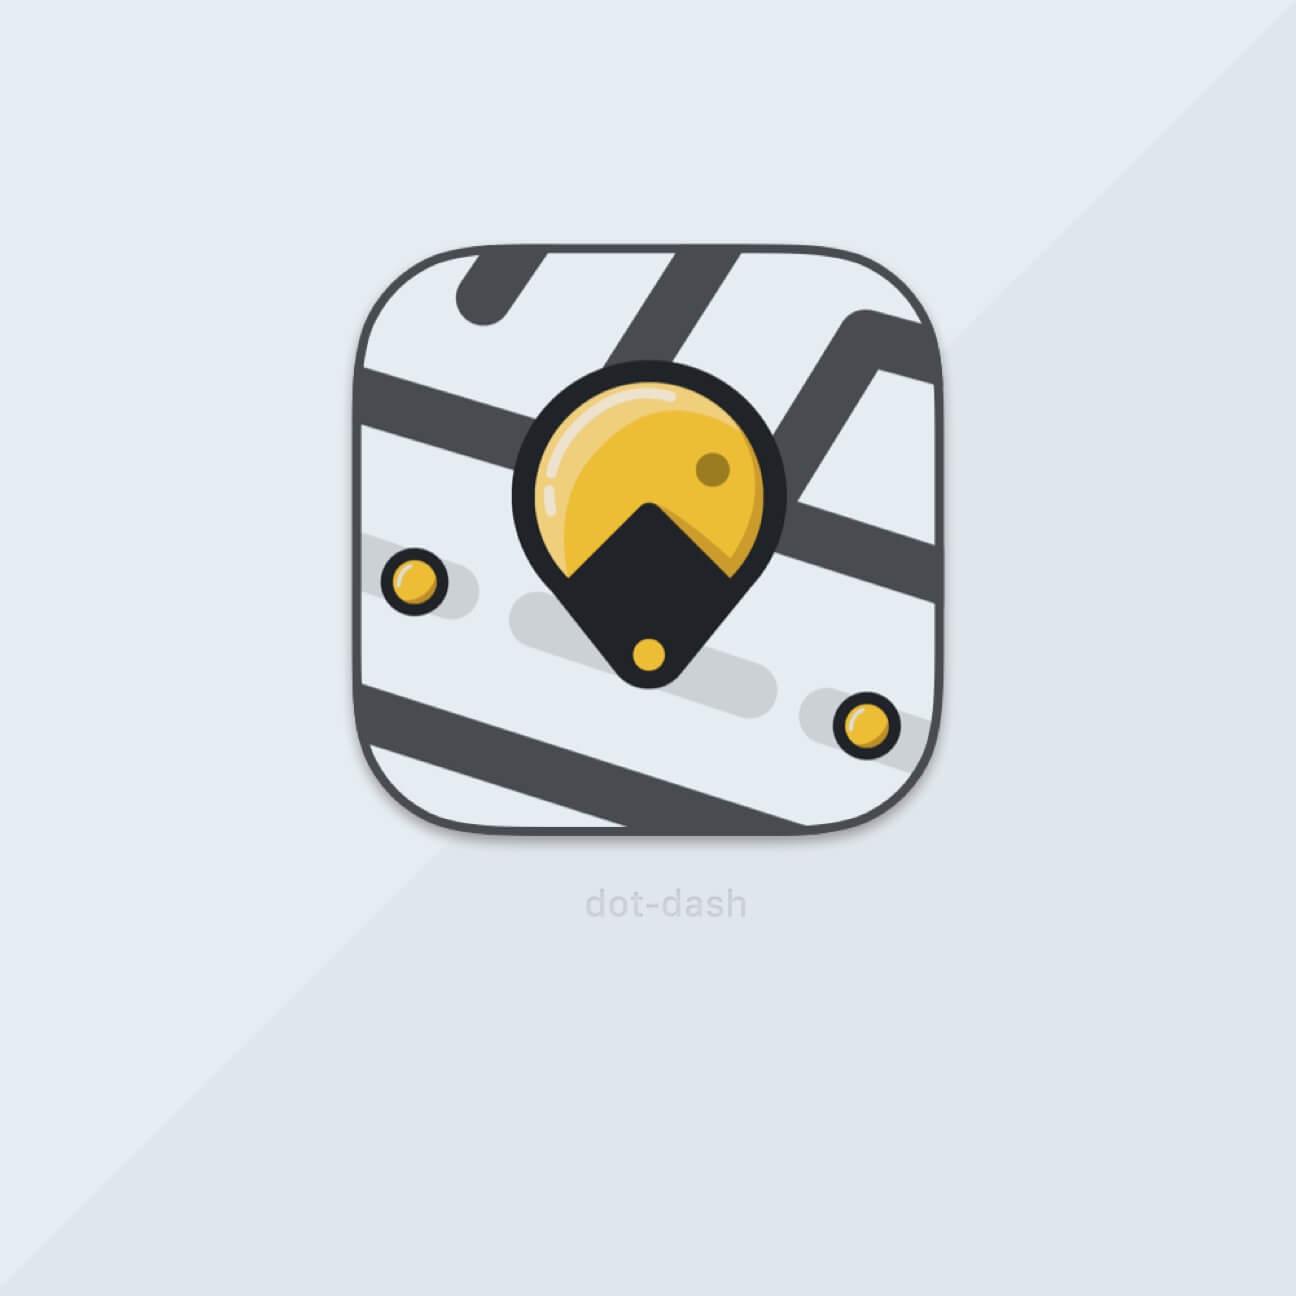 An icon design for an app called Dot-Dash